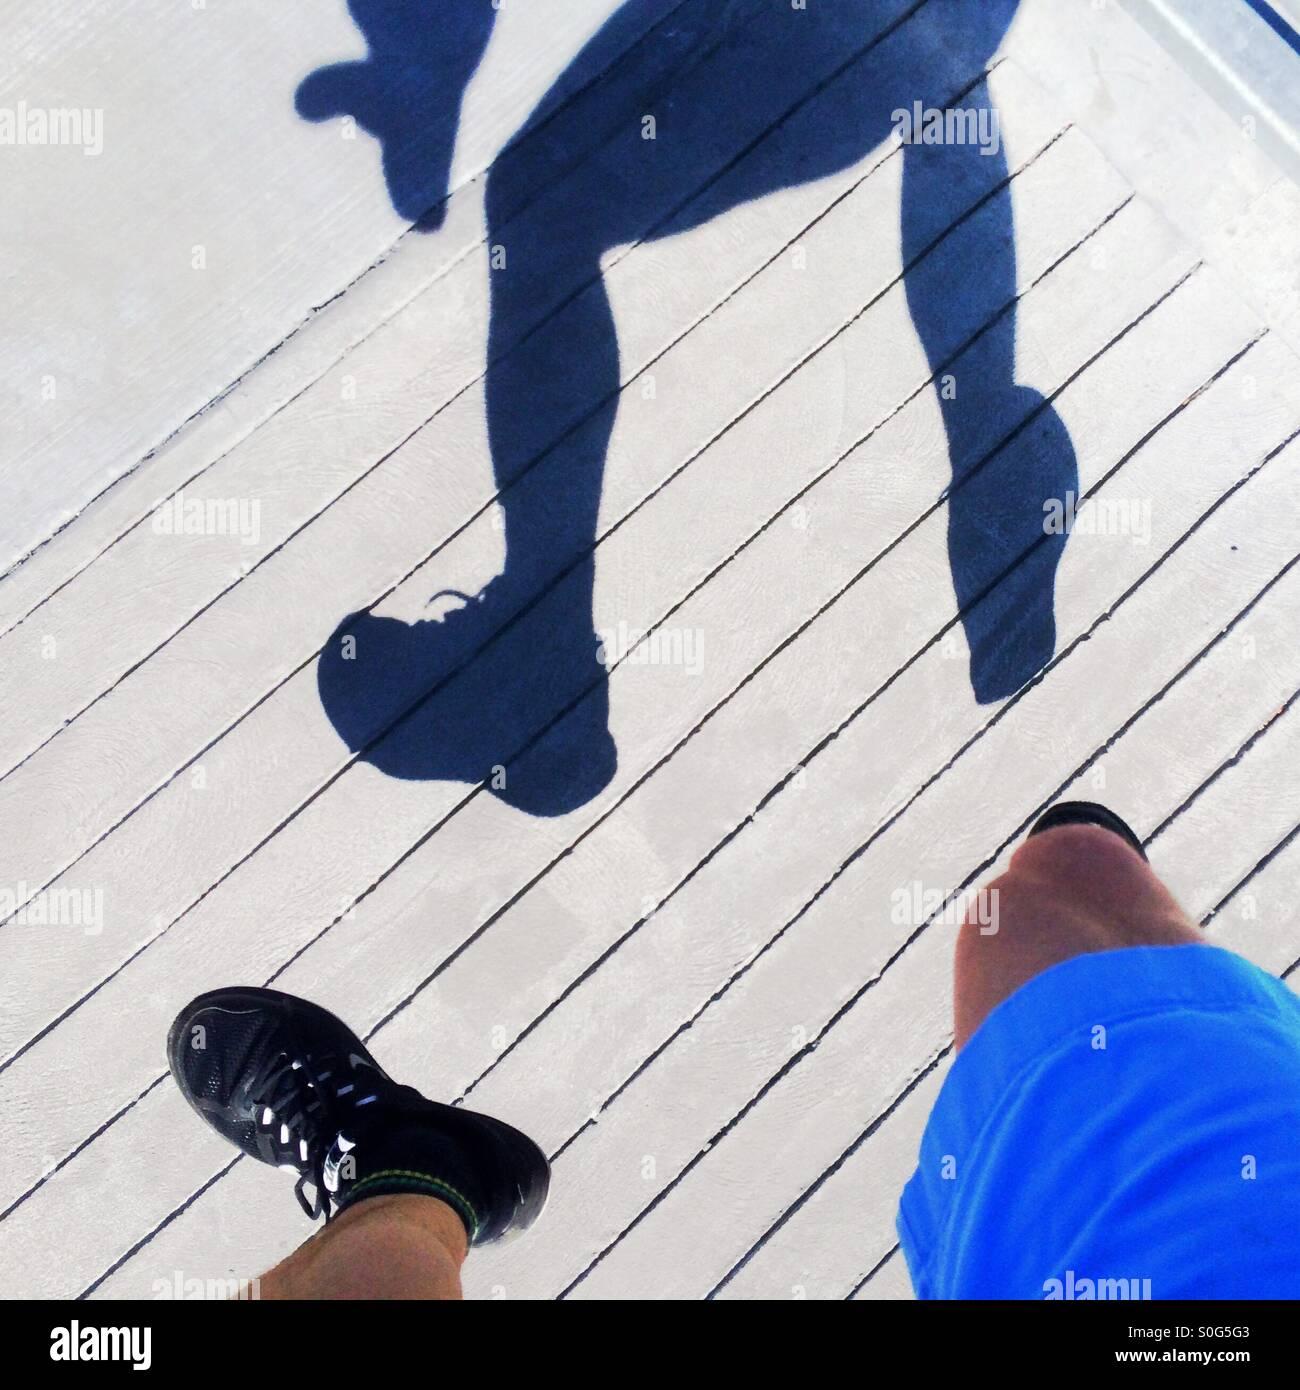 Jumping man - Stock Image